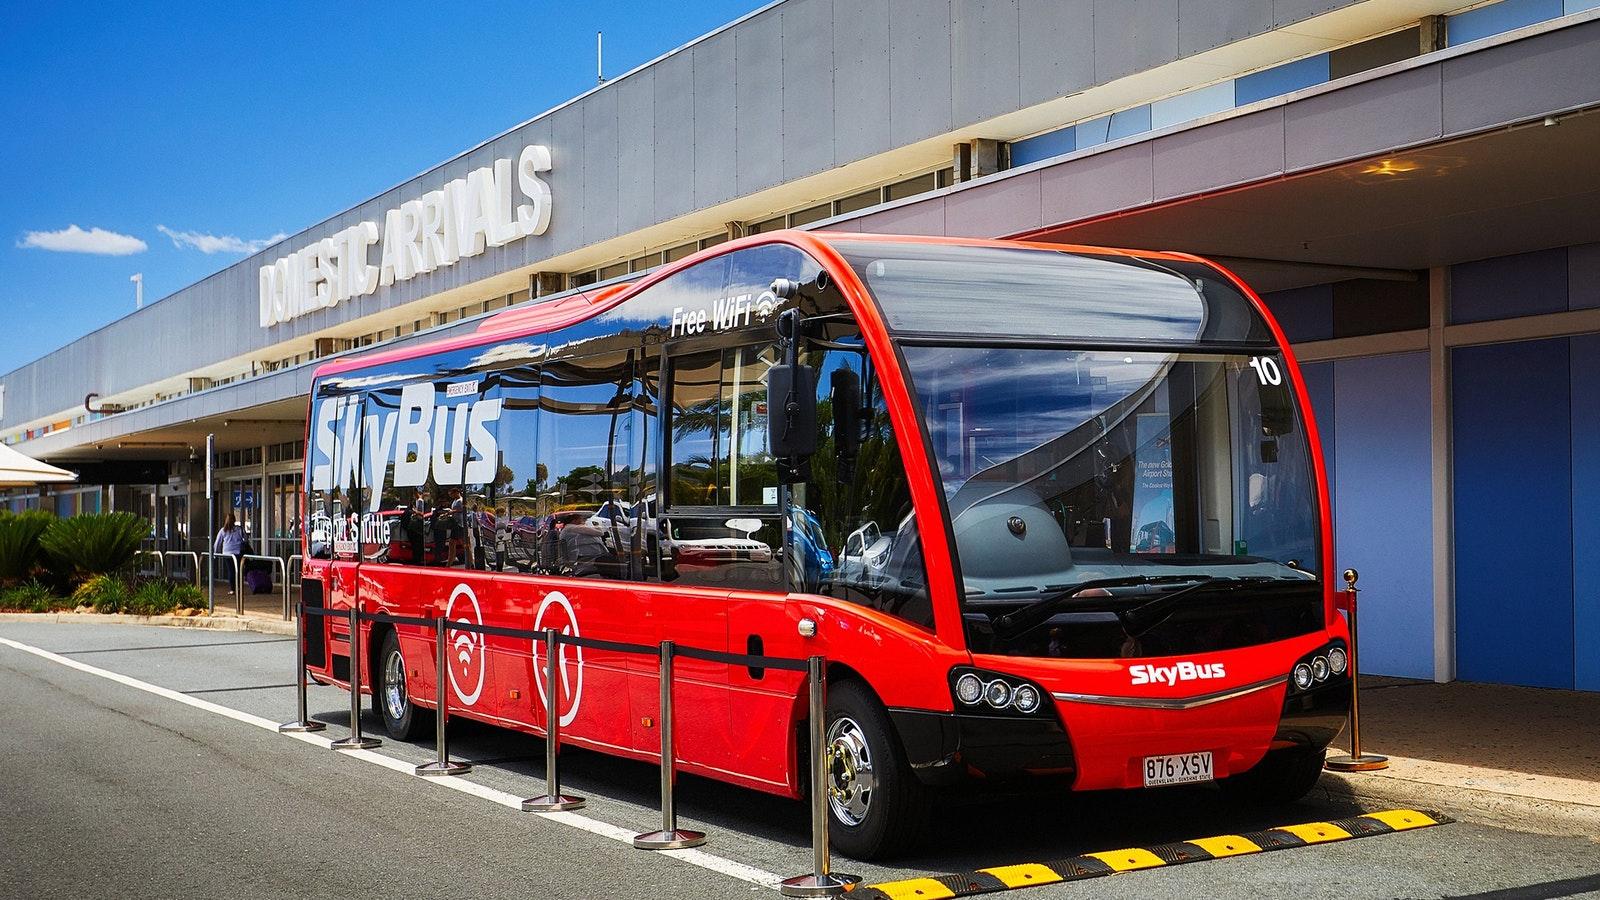 Skybus Transport Melbourne Victoria Australia